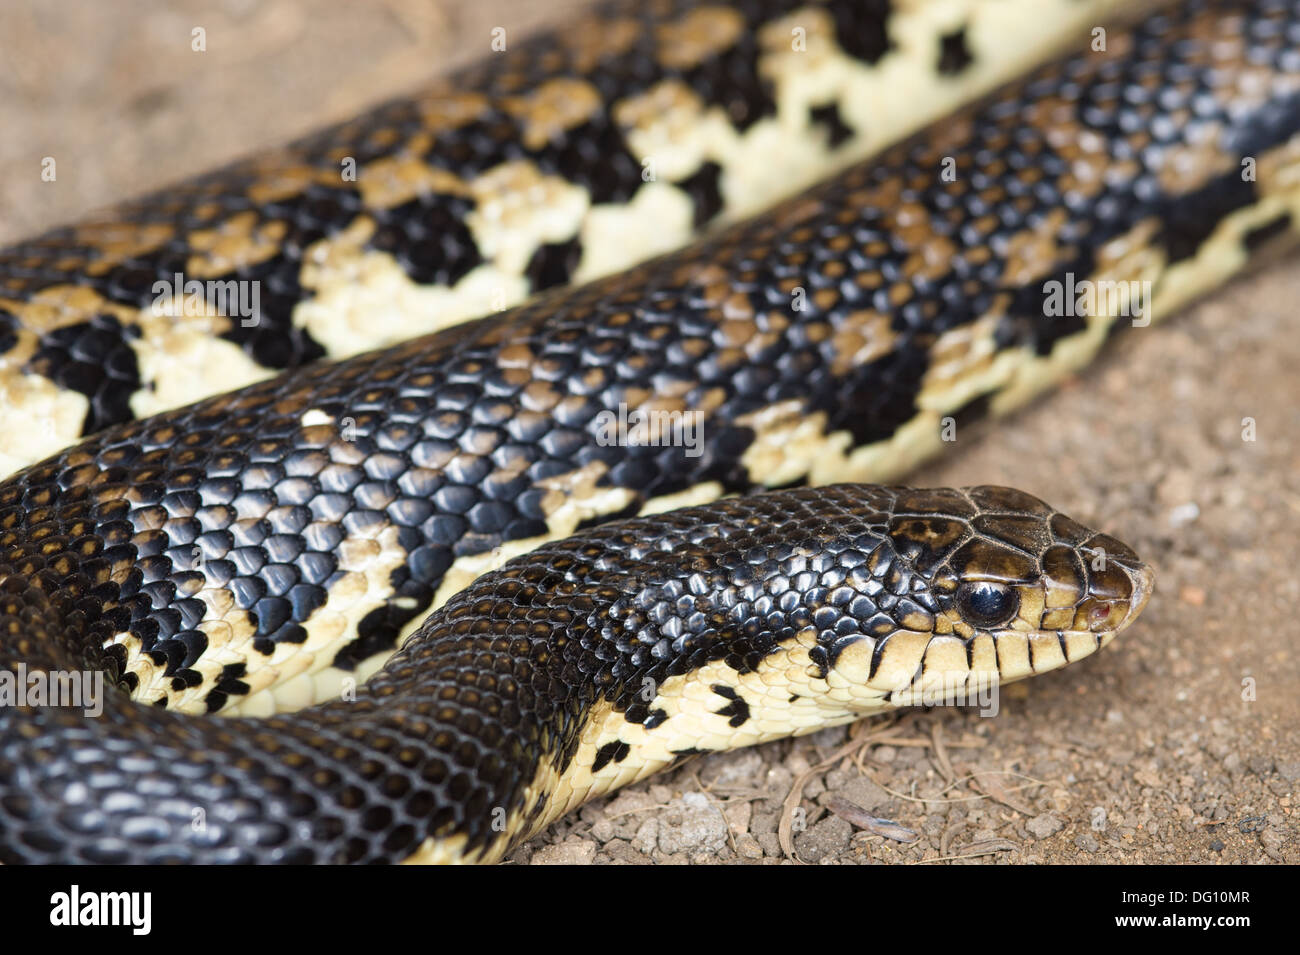 Madagascar hognose snake, naturaleza Peyrieras Leioheterondon madagascariensis, granja, Madagascar Imagen De Stock